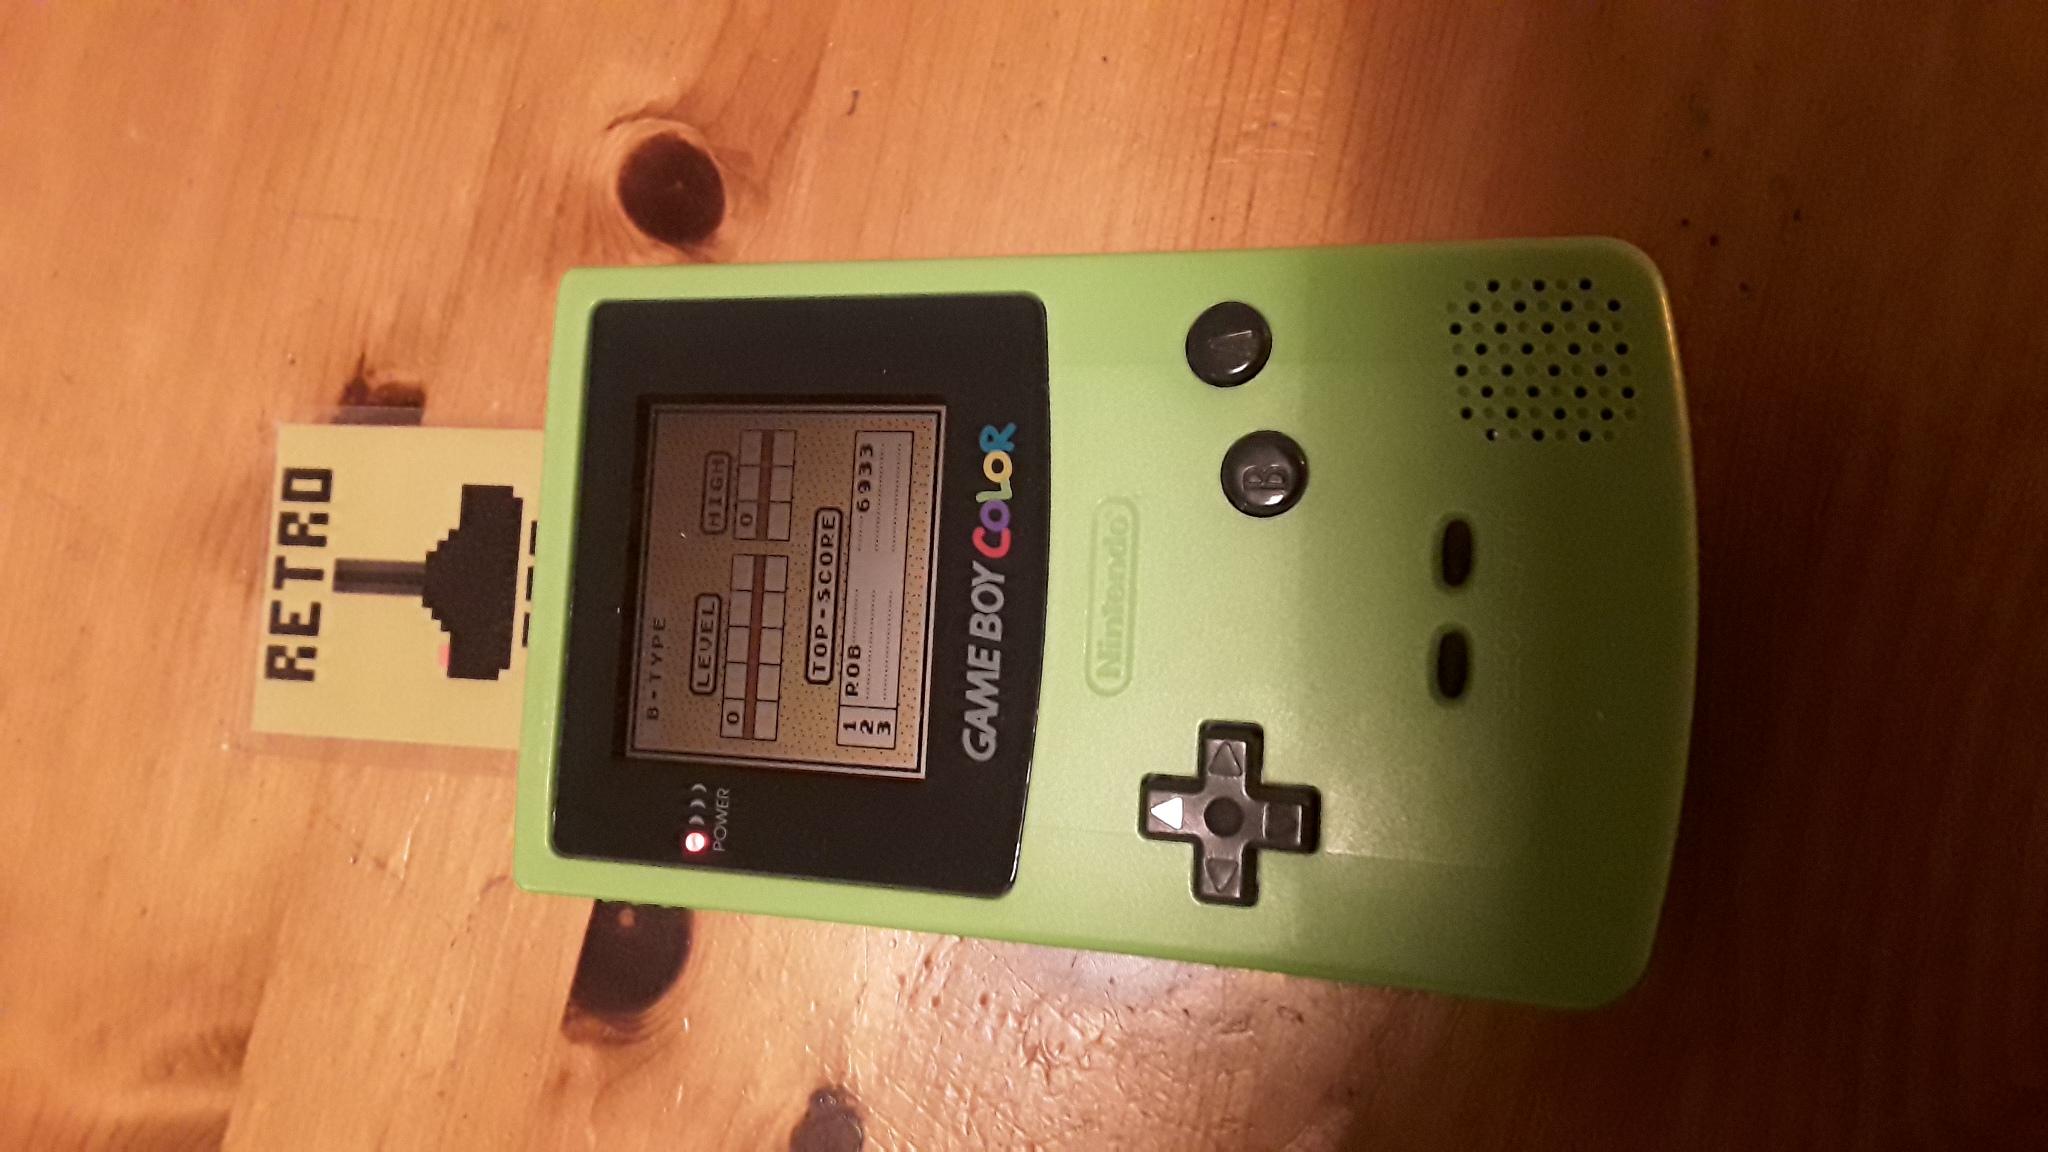 RetroRob: Tetris: Type B [Level 0 / High 0] (Game Boy) 6,933 points on 2020-10-02 13:40:42